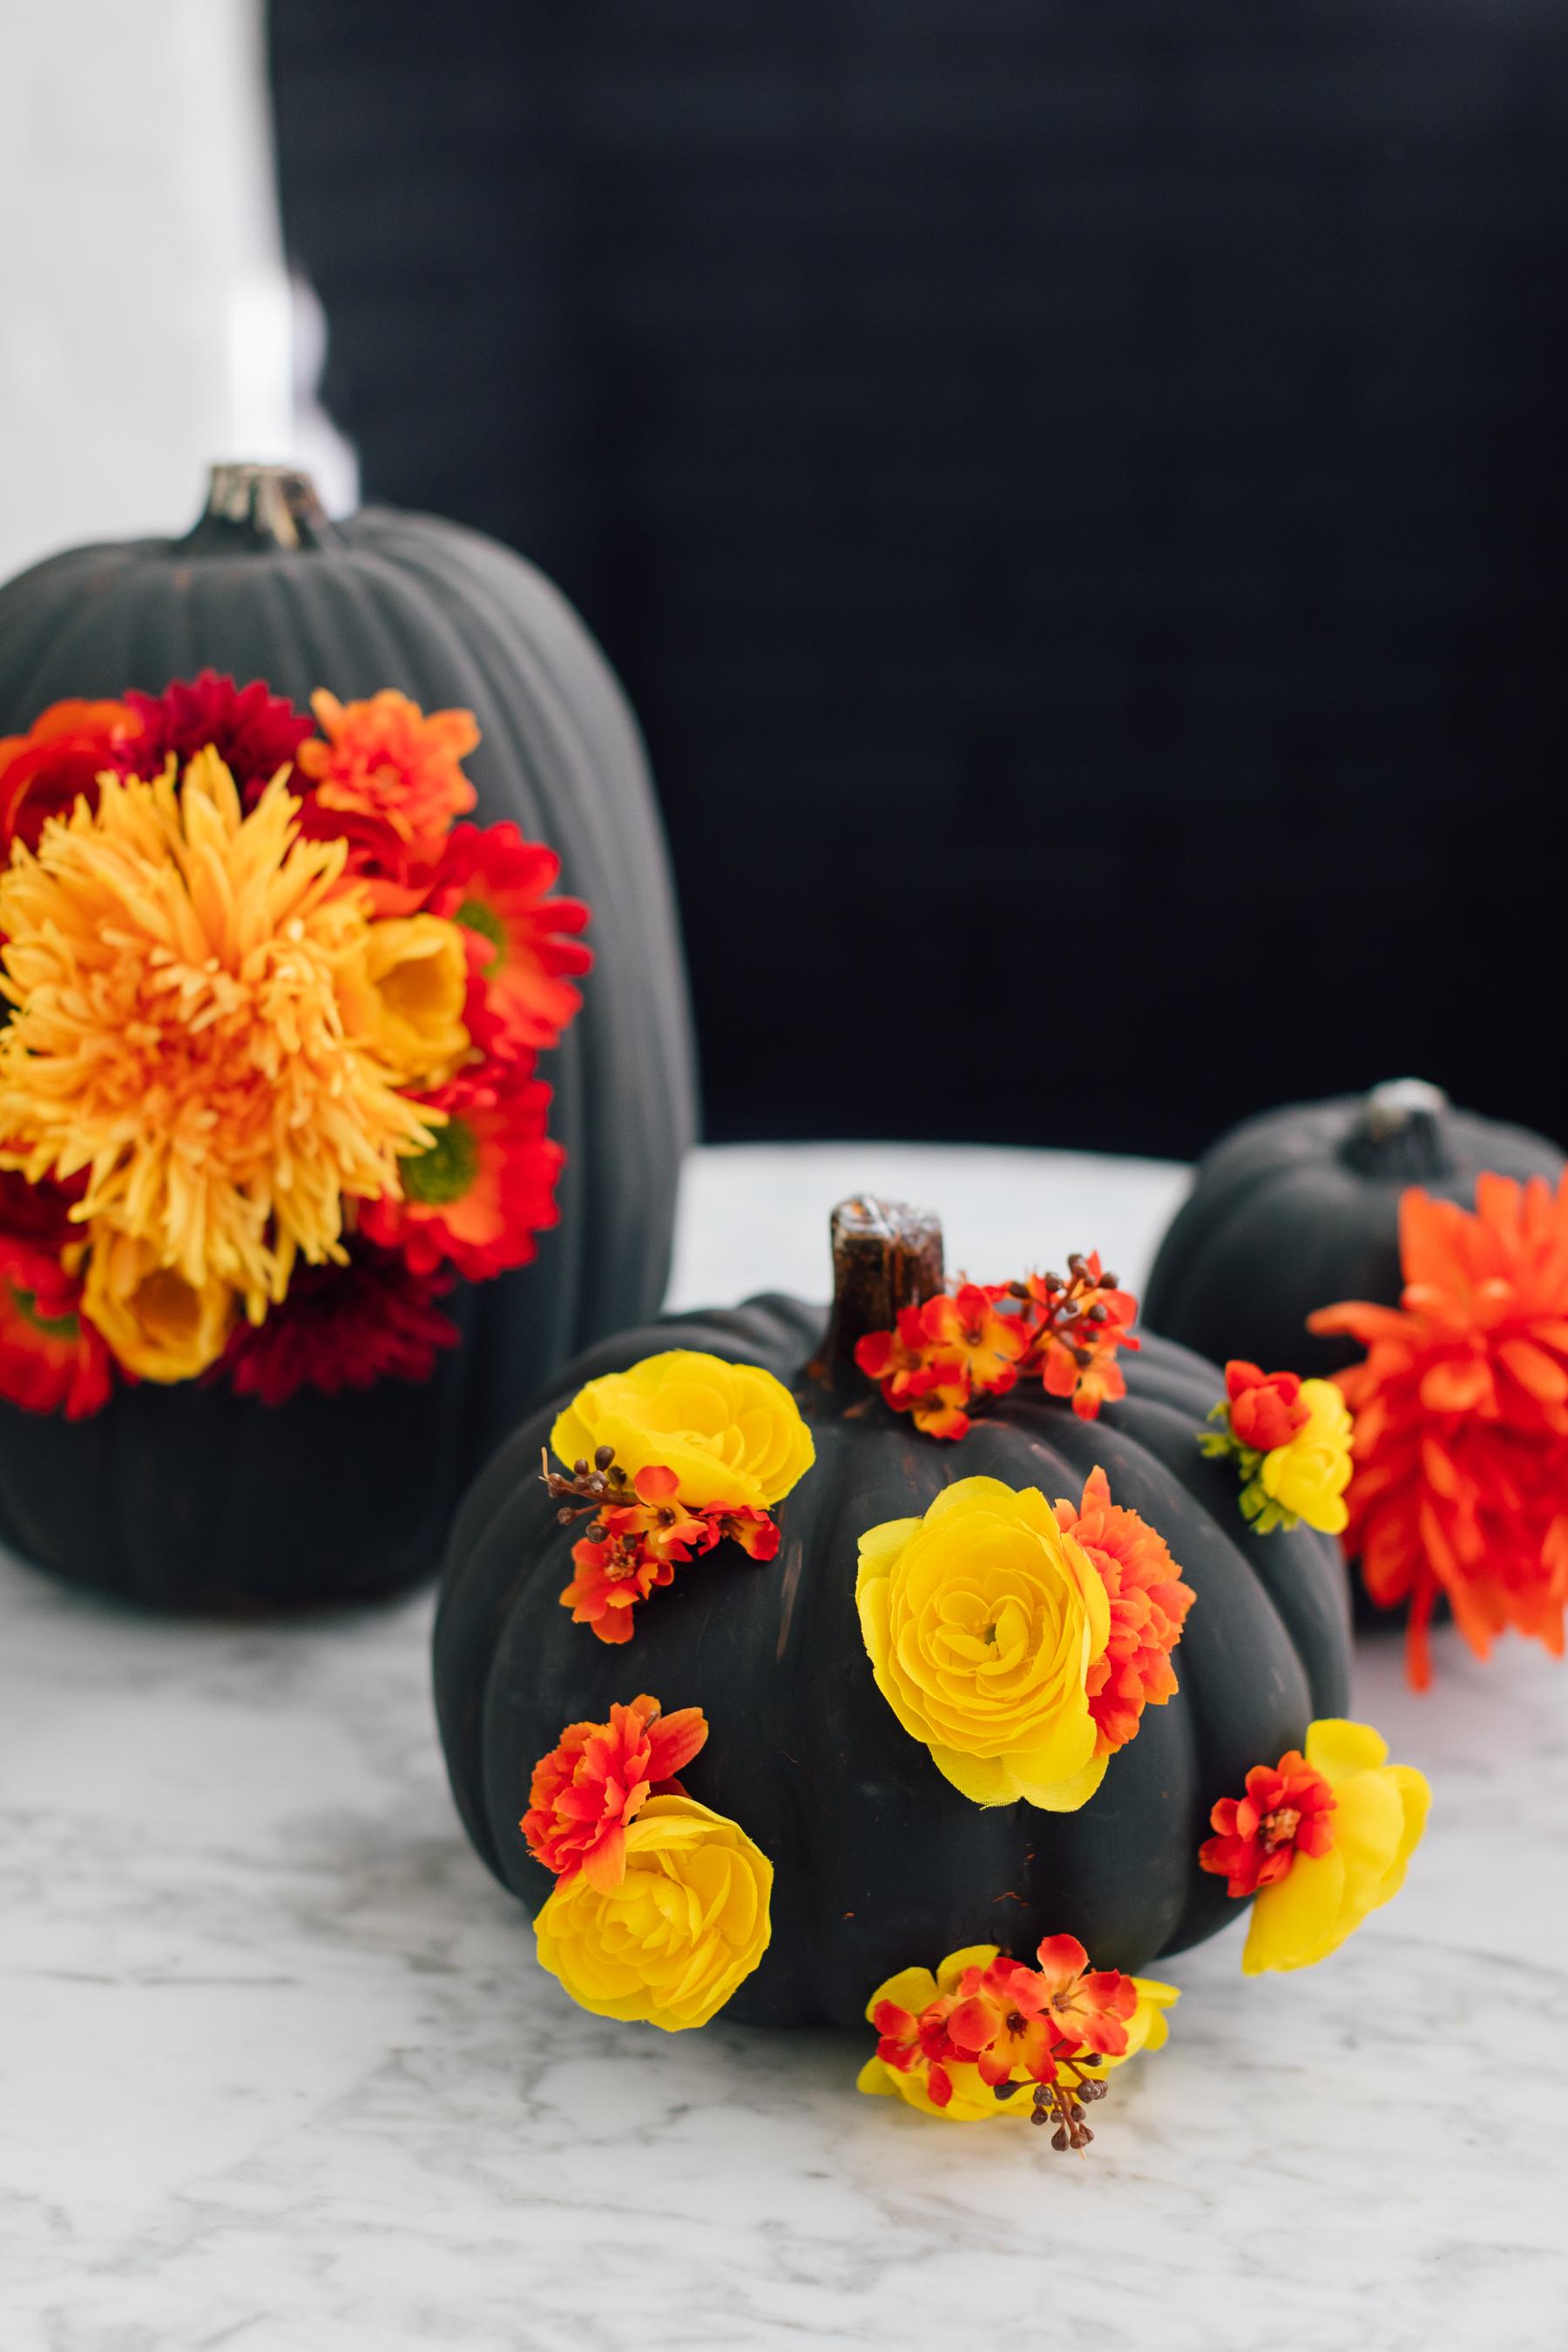 Eva Amurri Martino shares an easy fall DIY for faux floral pumpkins